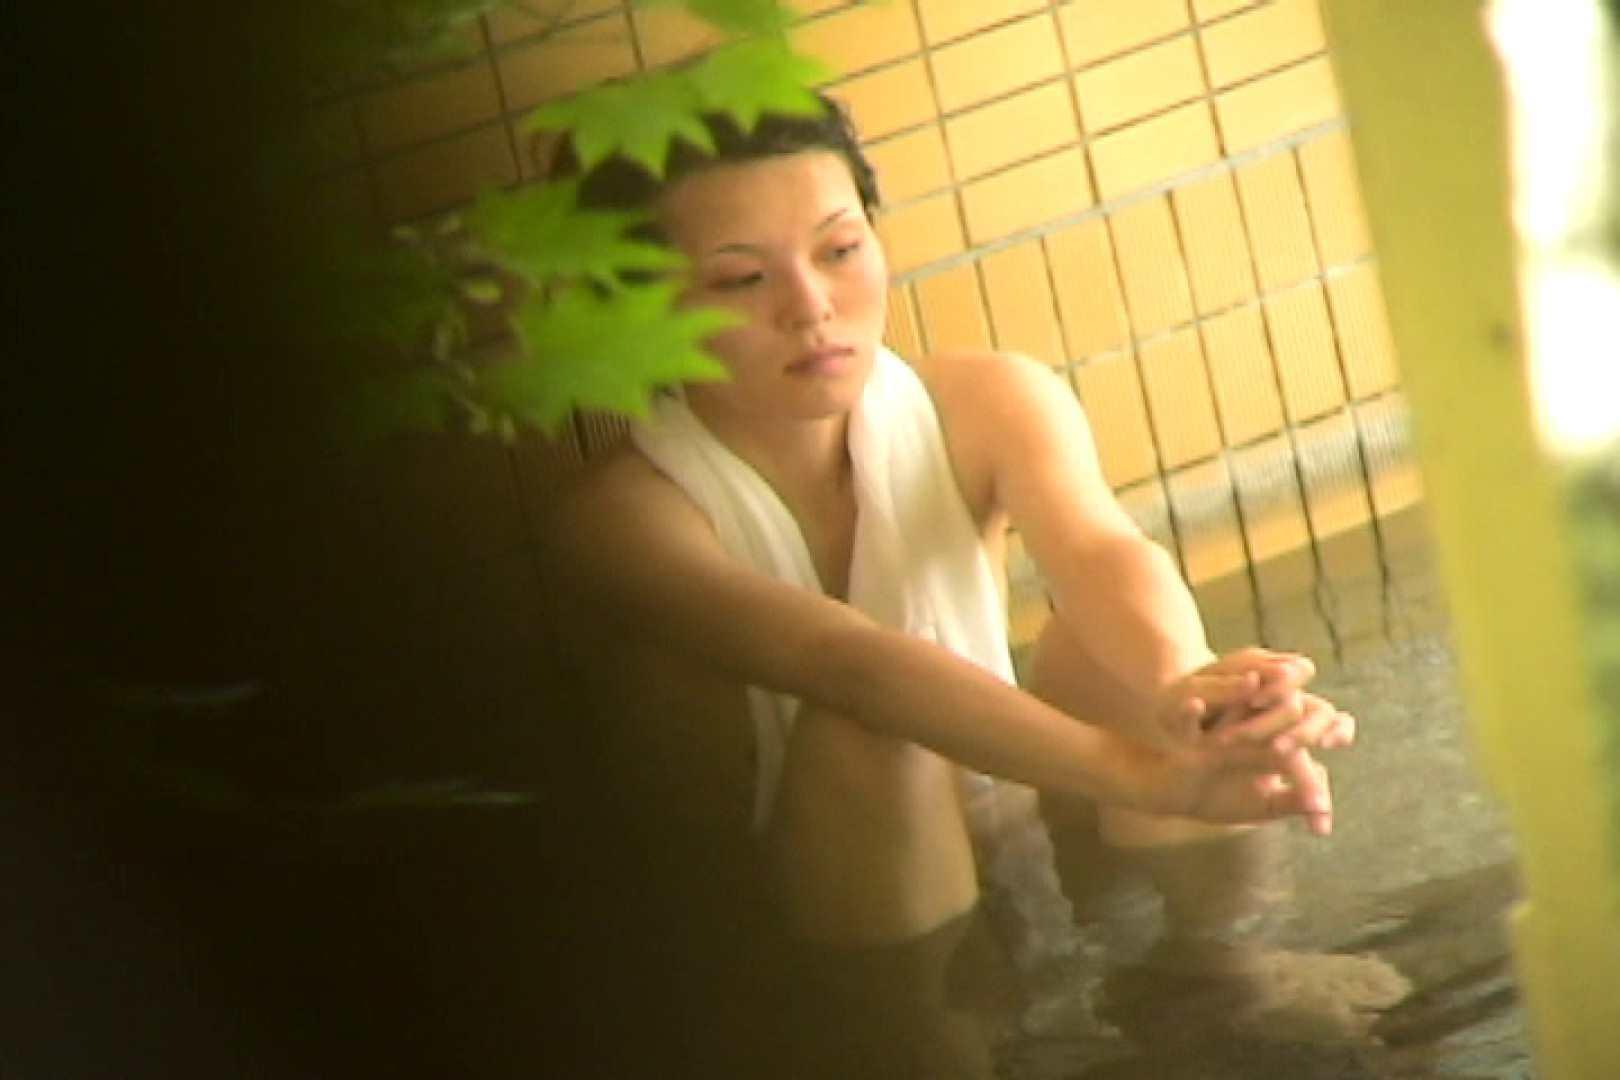 Aquaな露天風呂Vol.703 0 | 0  57連発 13